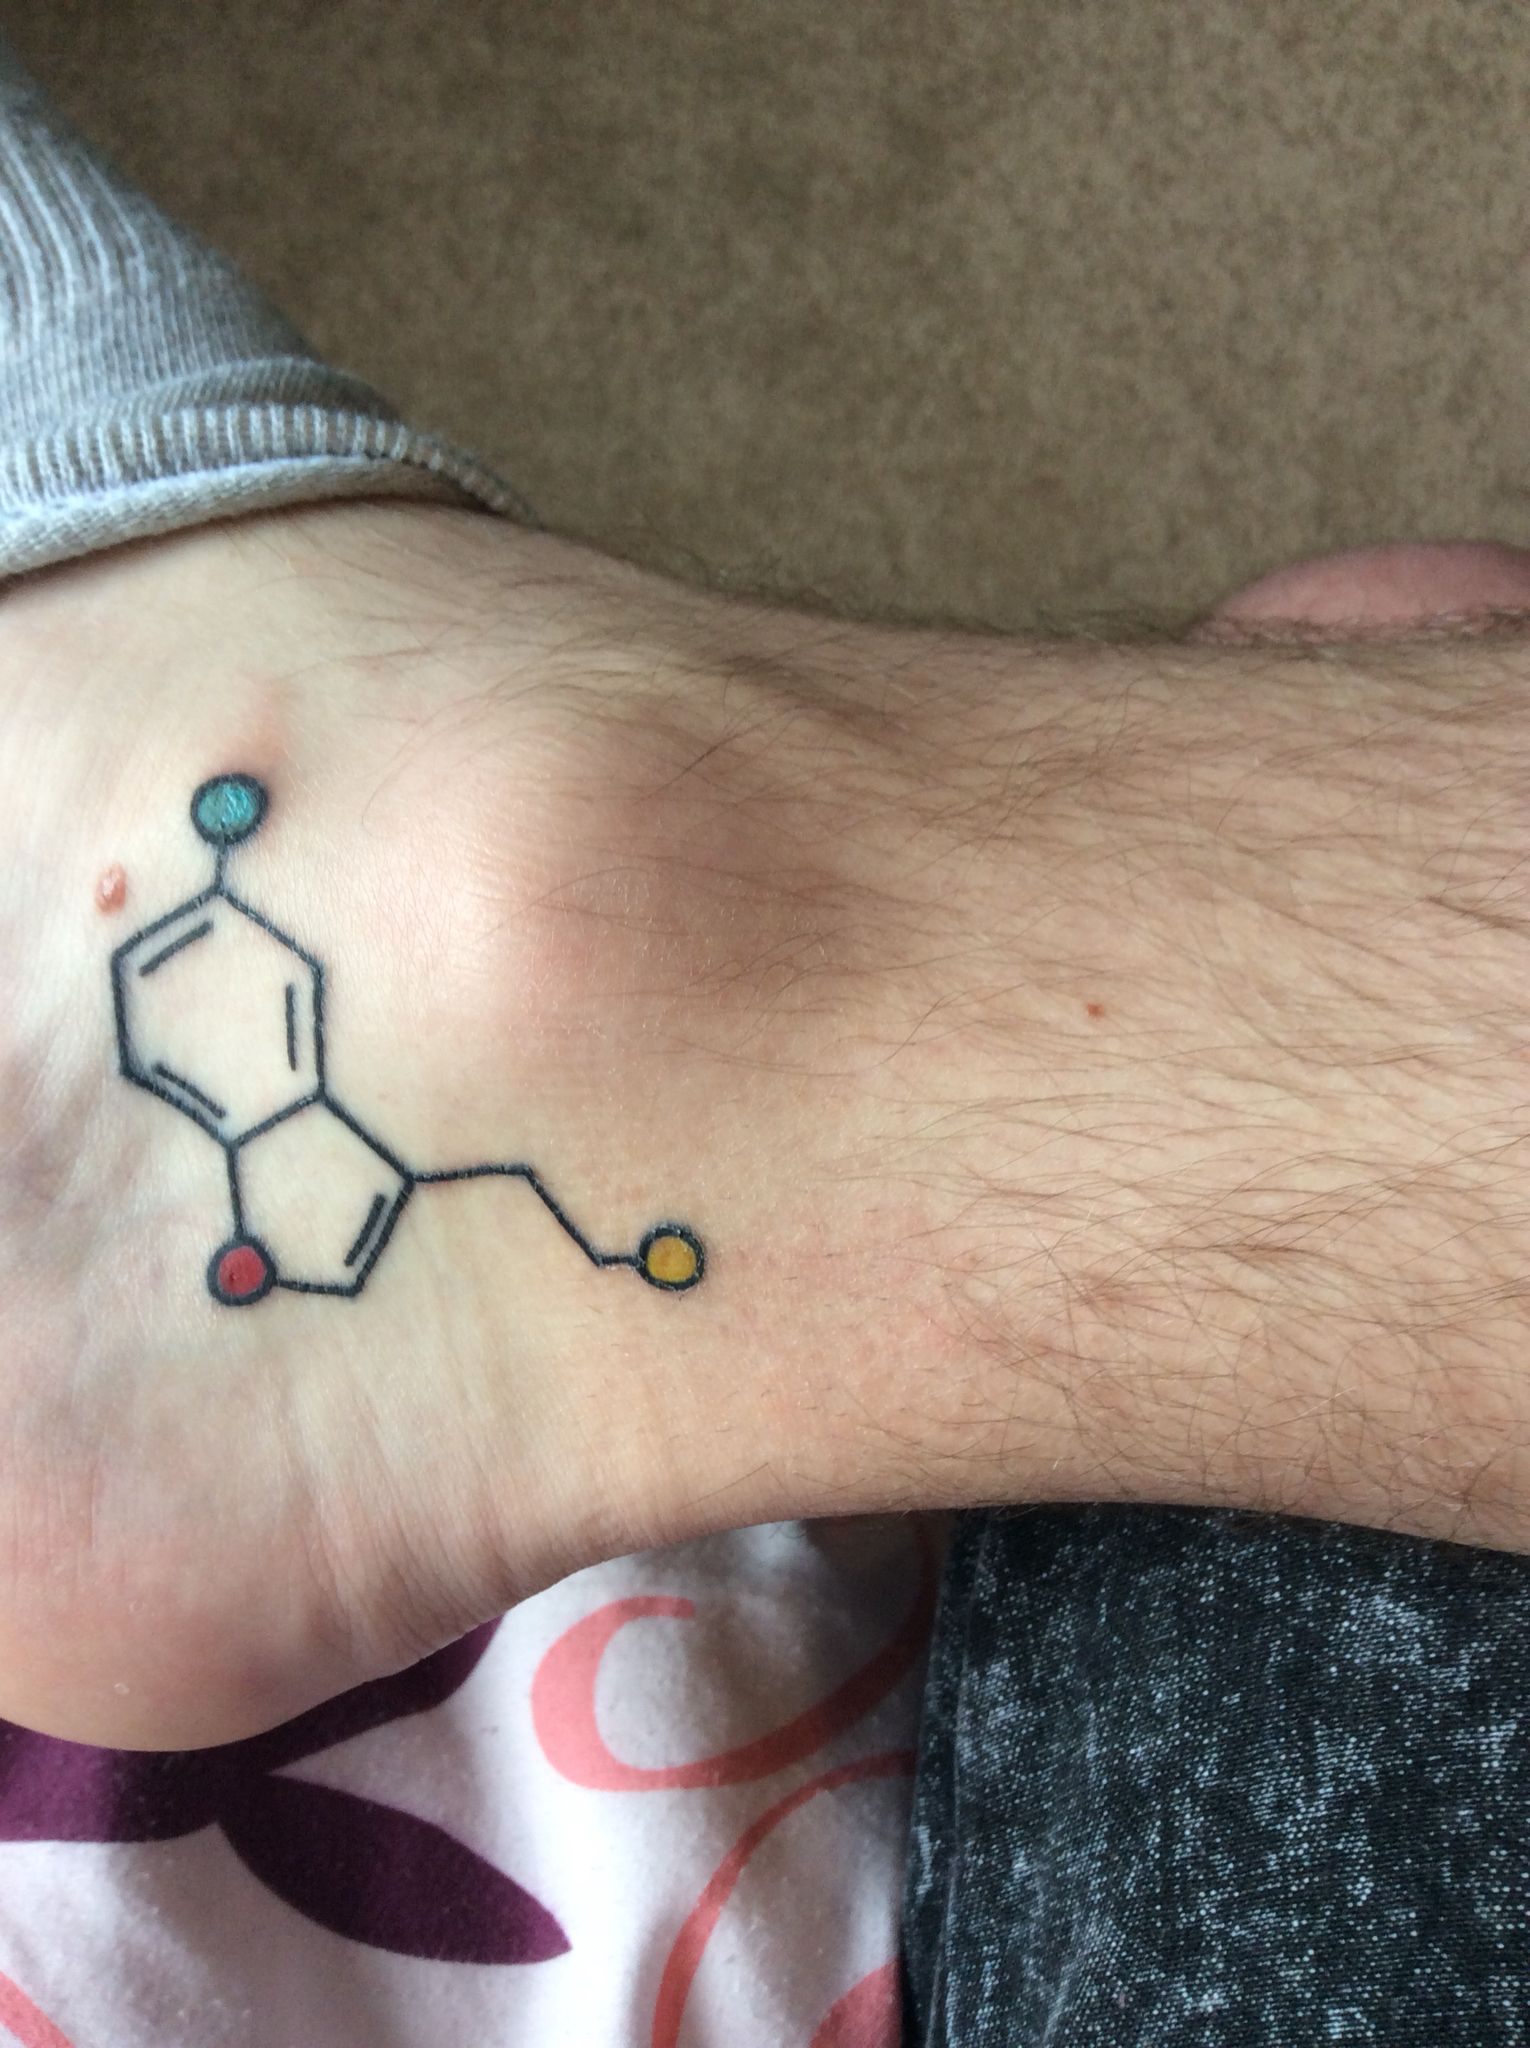 Serotonin Molecule Tattoo @ Inked Up Chester - 3/4/15 | tattoo ...